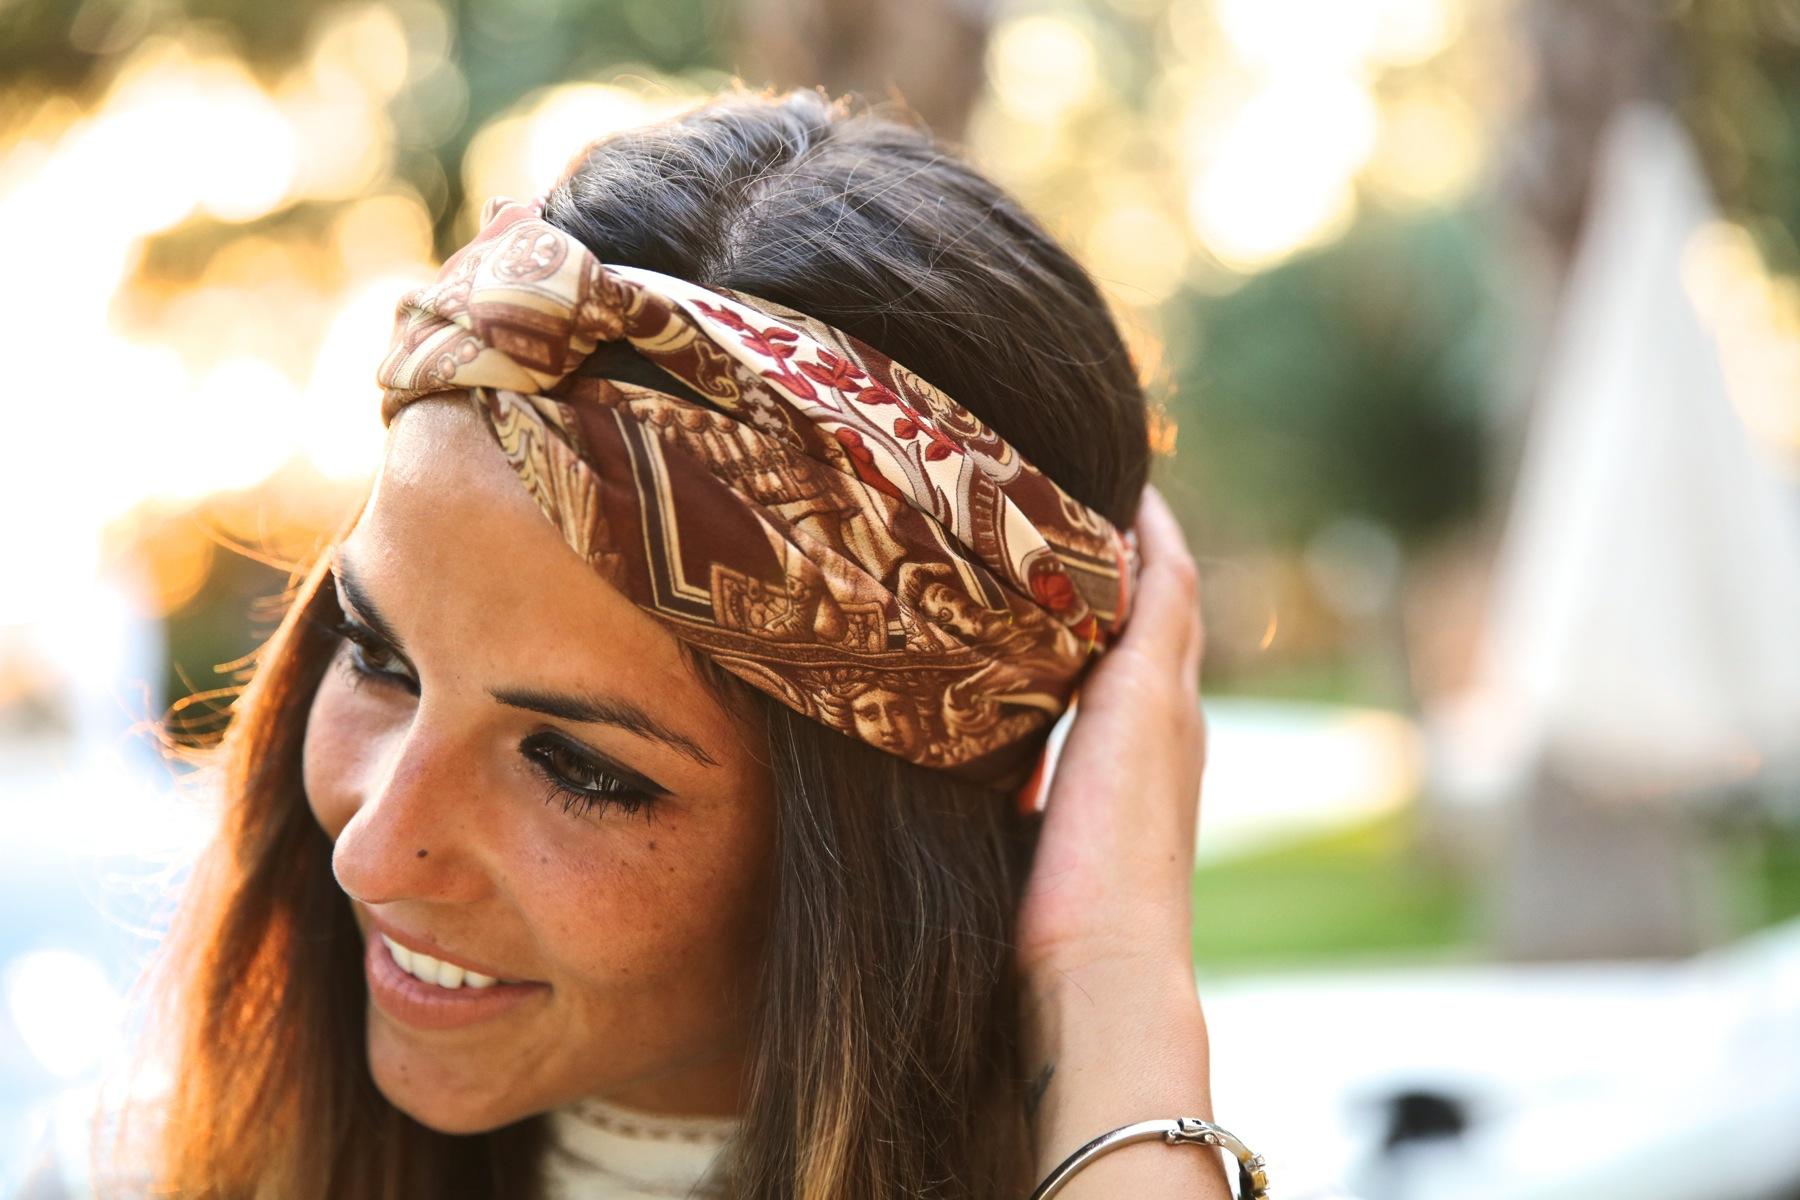 trendy_taste-look-outfit-street_style-ootd-blog-blogger-fashion_spain-moda_españa-boho-hippie-denim_shorts-shorts_vaqueros-blusa-blouse-mas34-pg-ibiza-sa_talaia-1